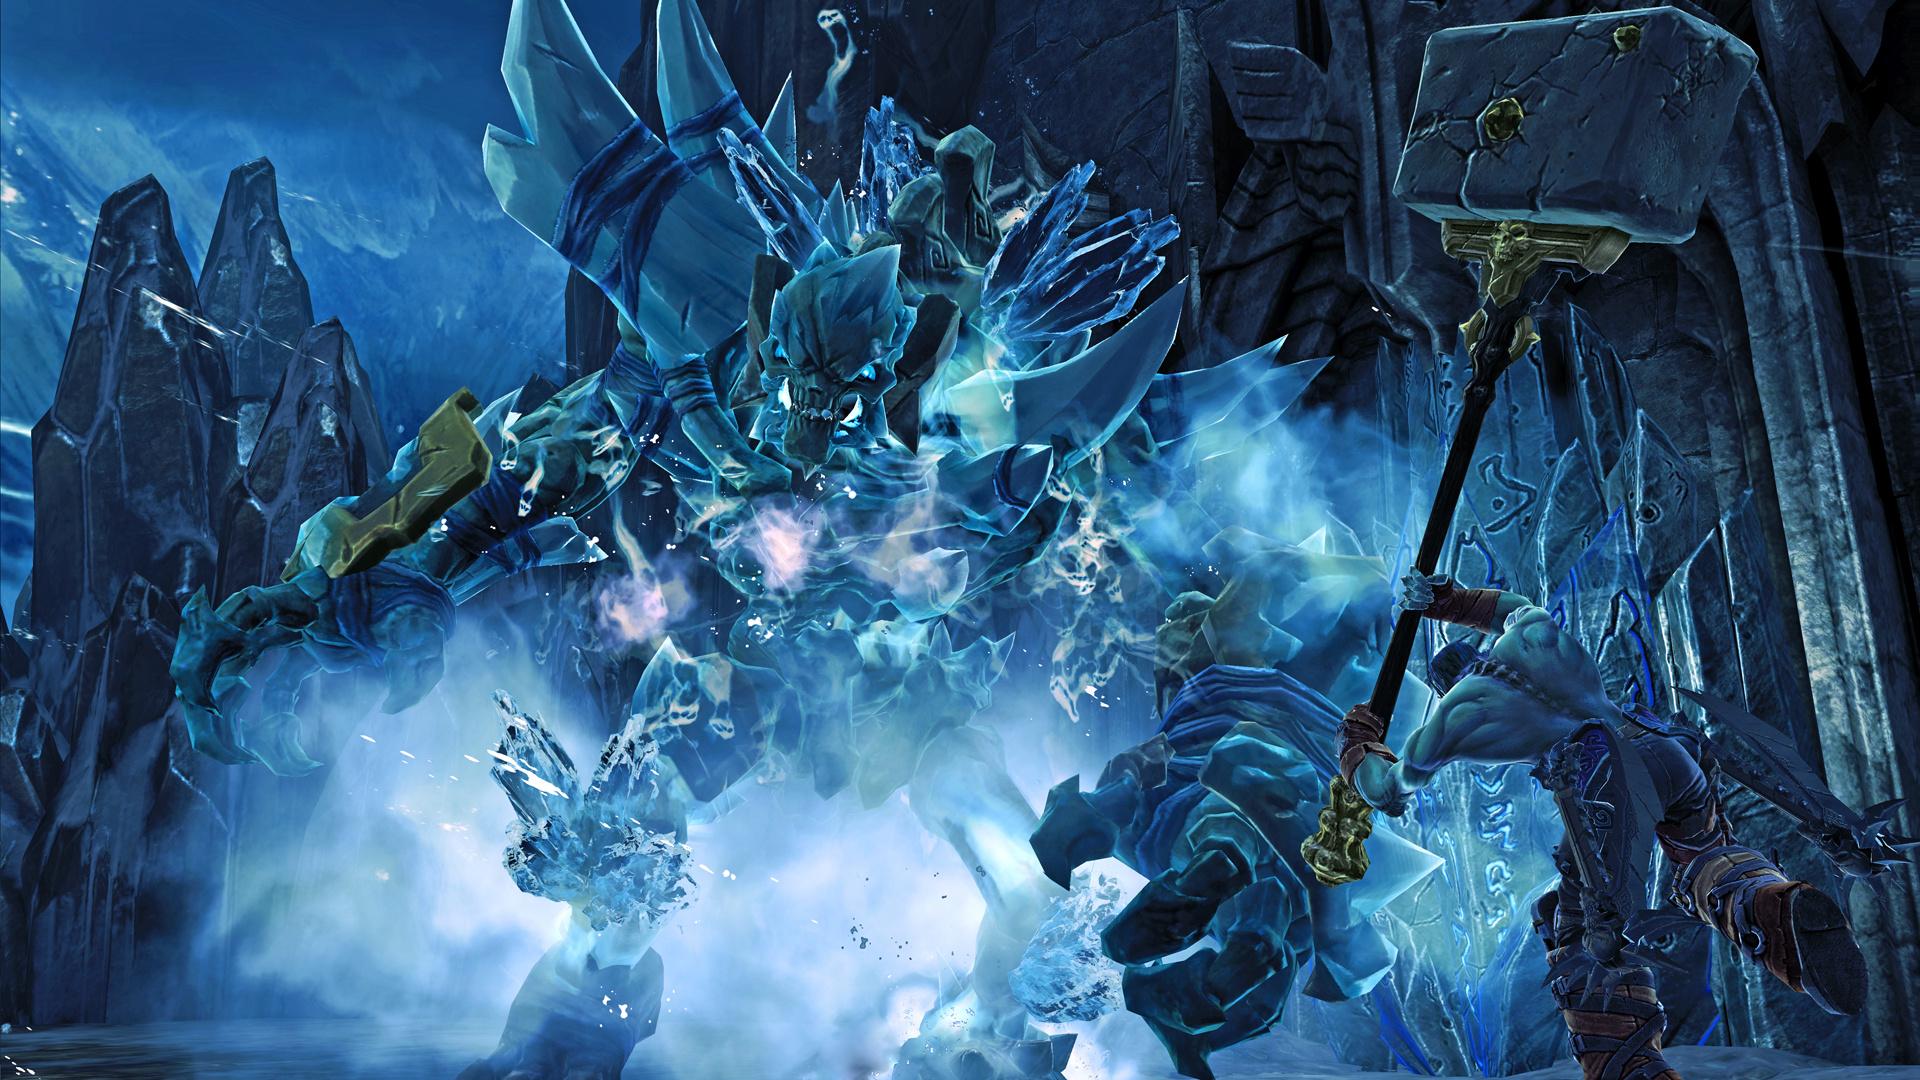 http://images.nintendolife.com/screenshots/42562/large.jpg